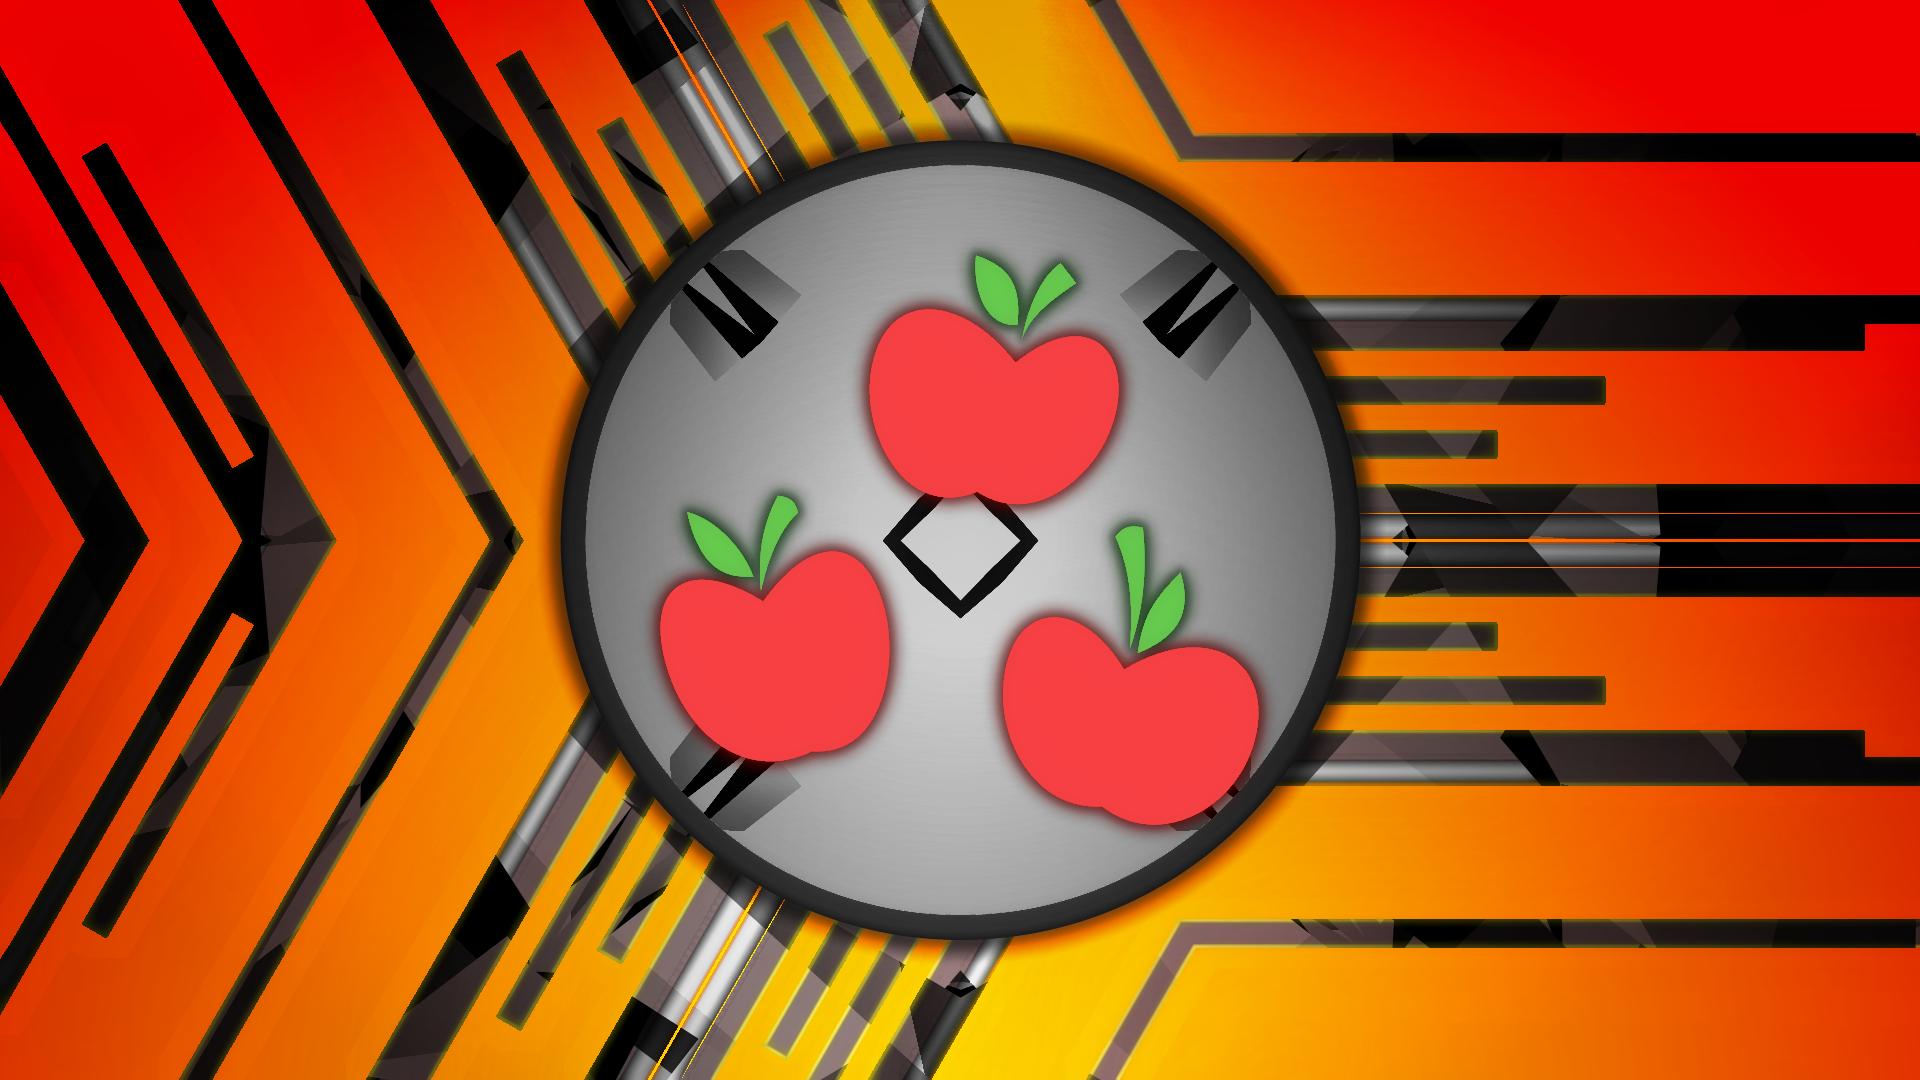 Applejack Cutie Mark Wallpaper by Game-BeatX14